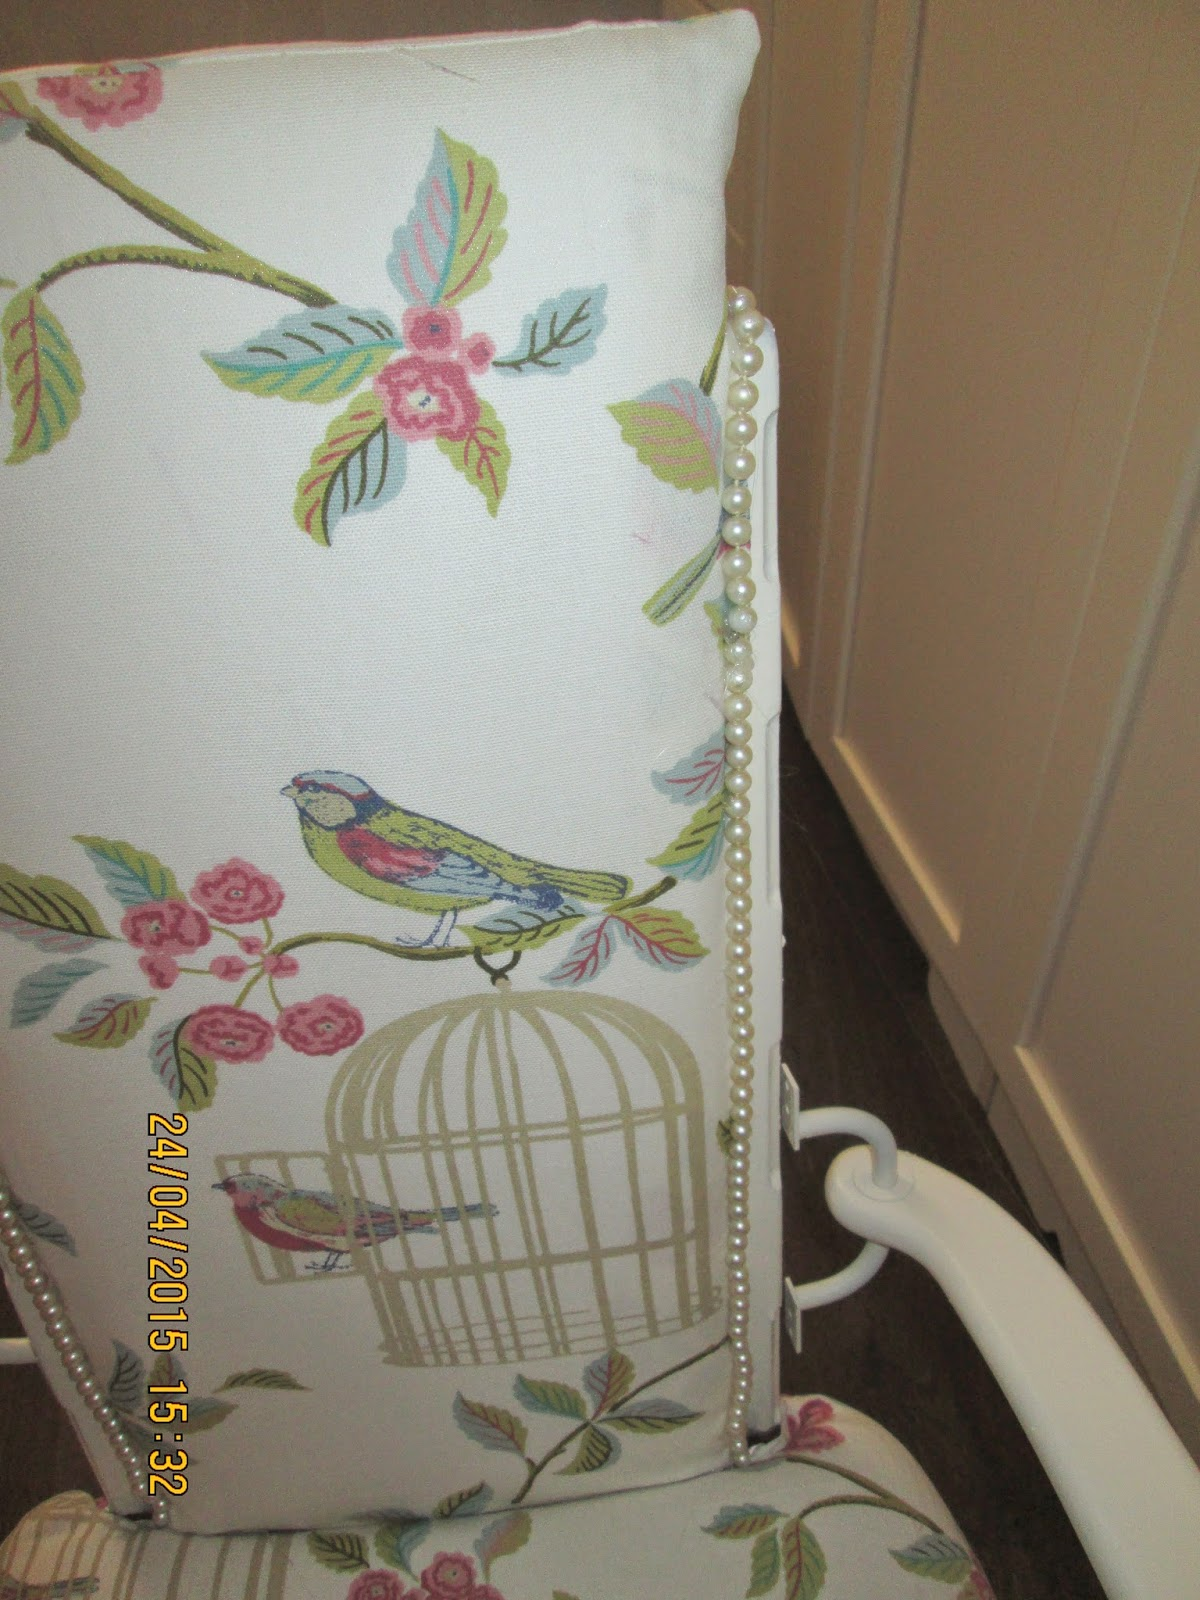 IMG 0054 - שדרוג כורסא ישנה